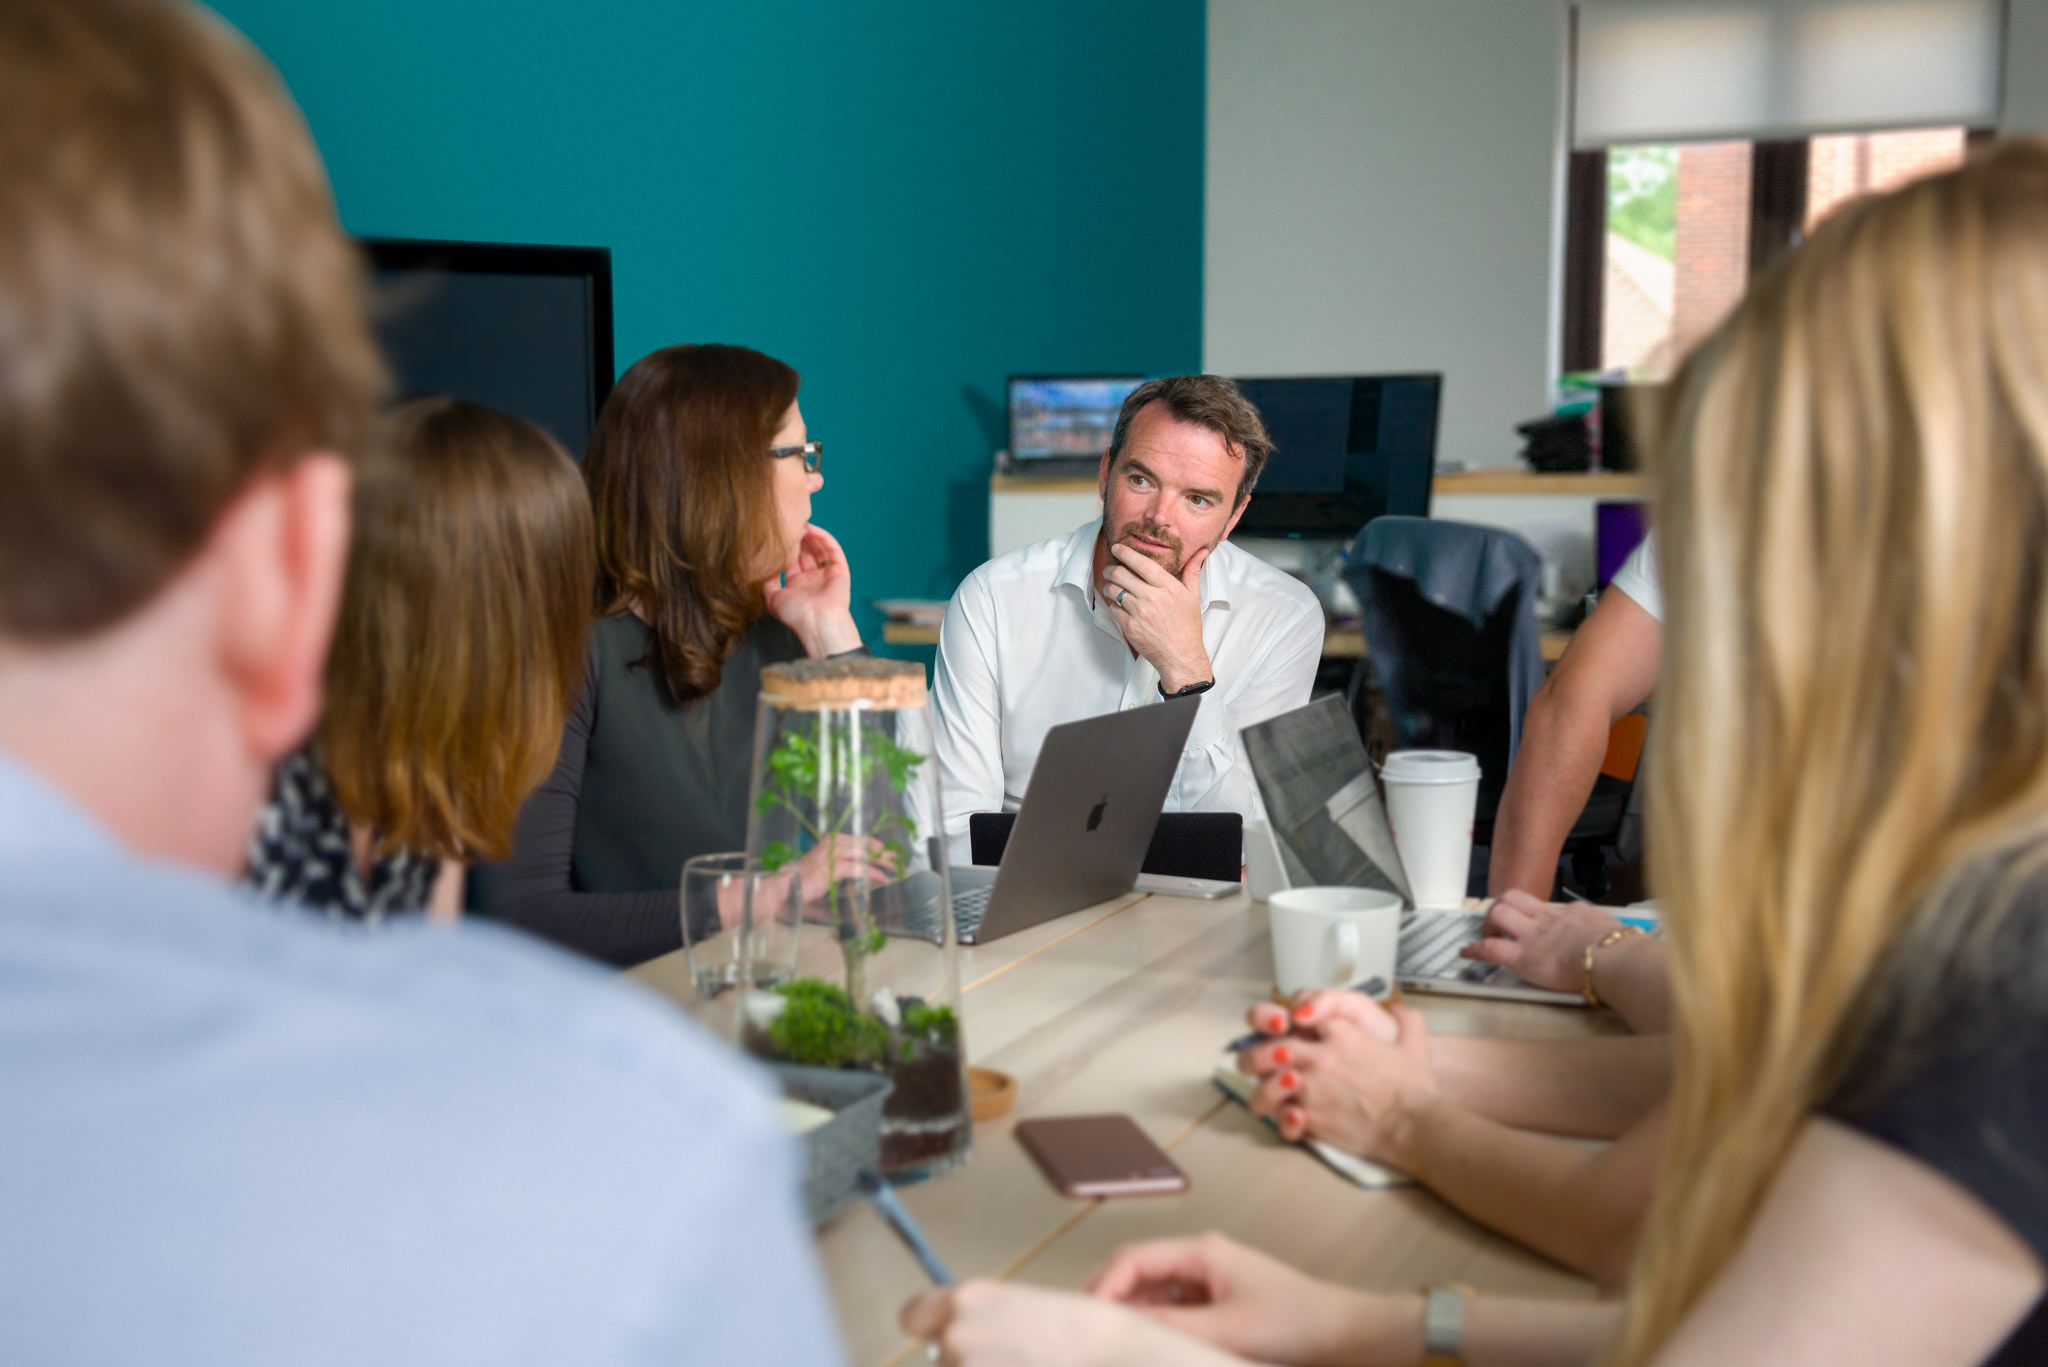 BabelQuest HubSpot solutions partner